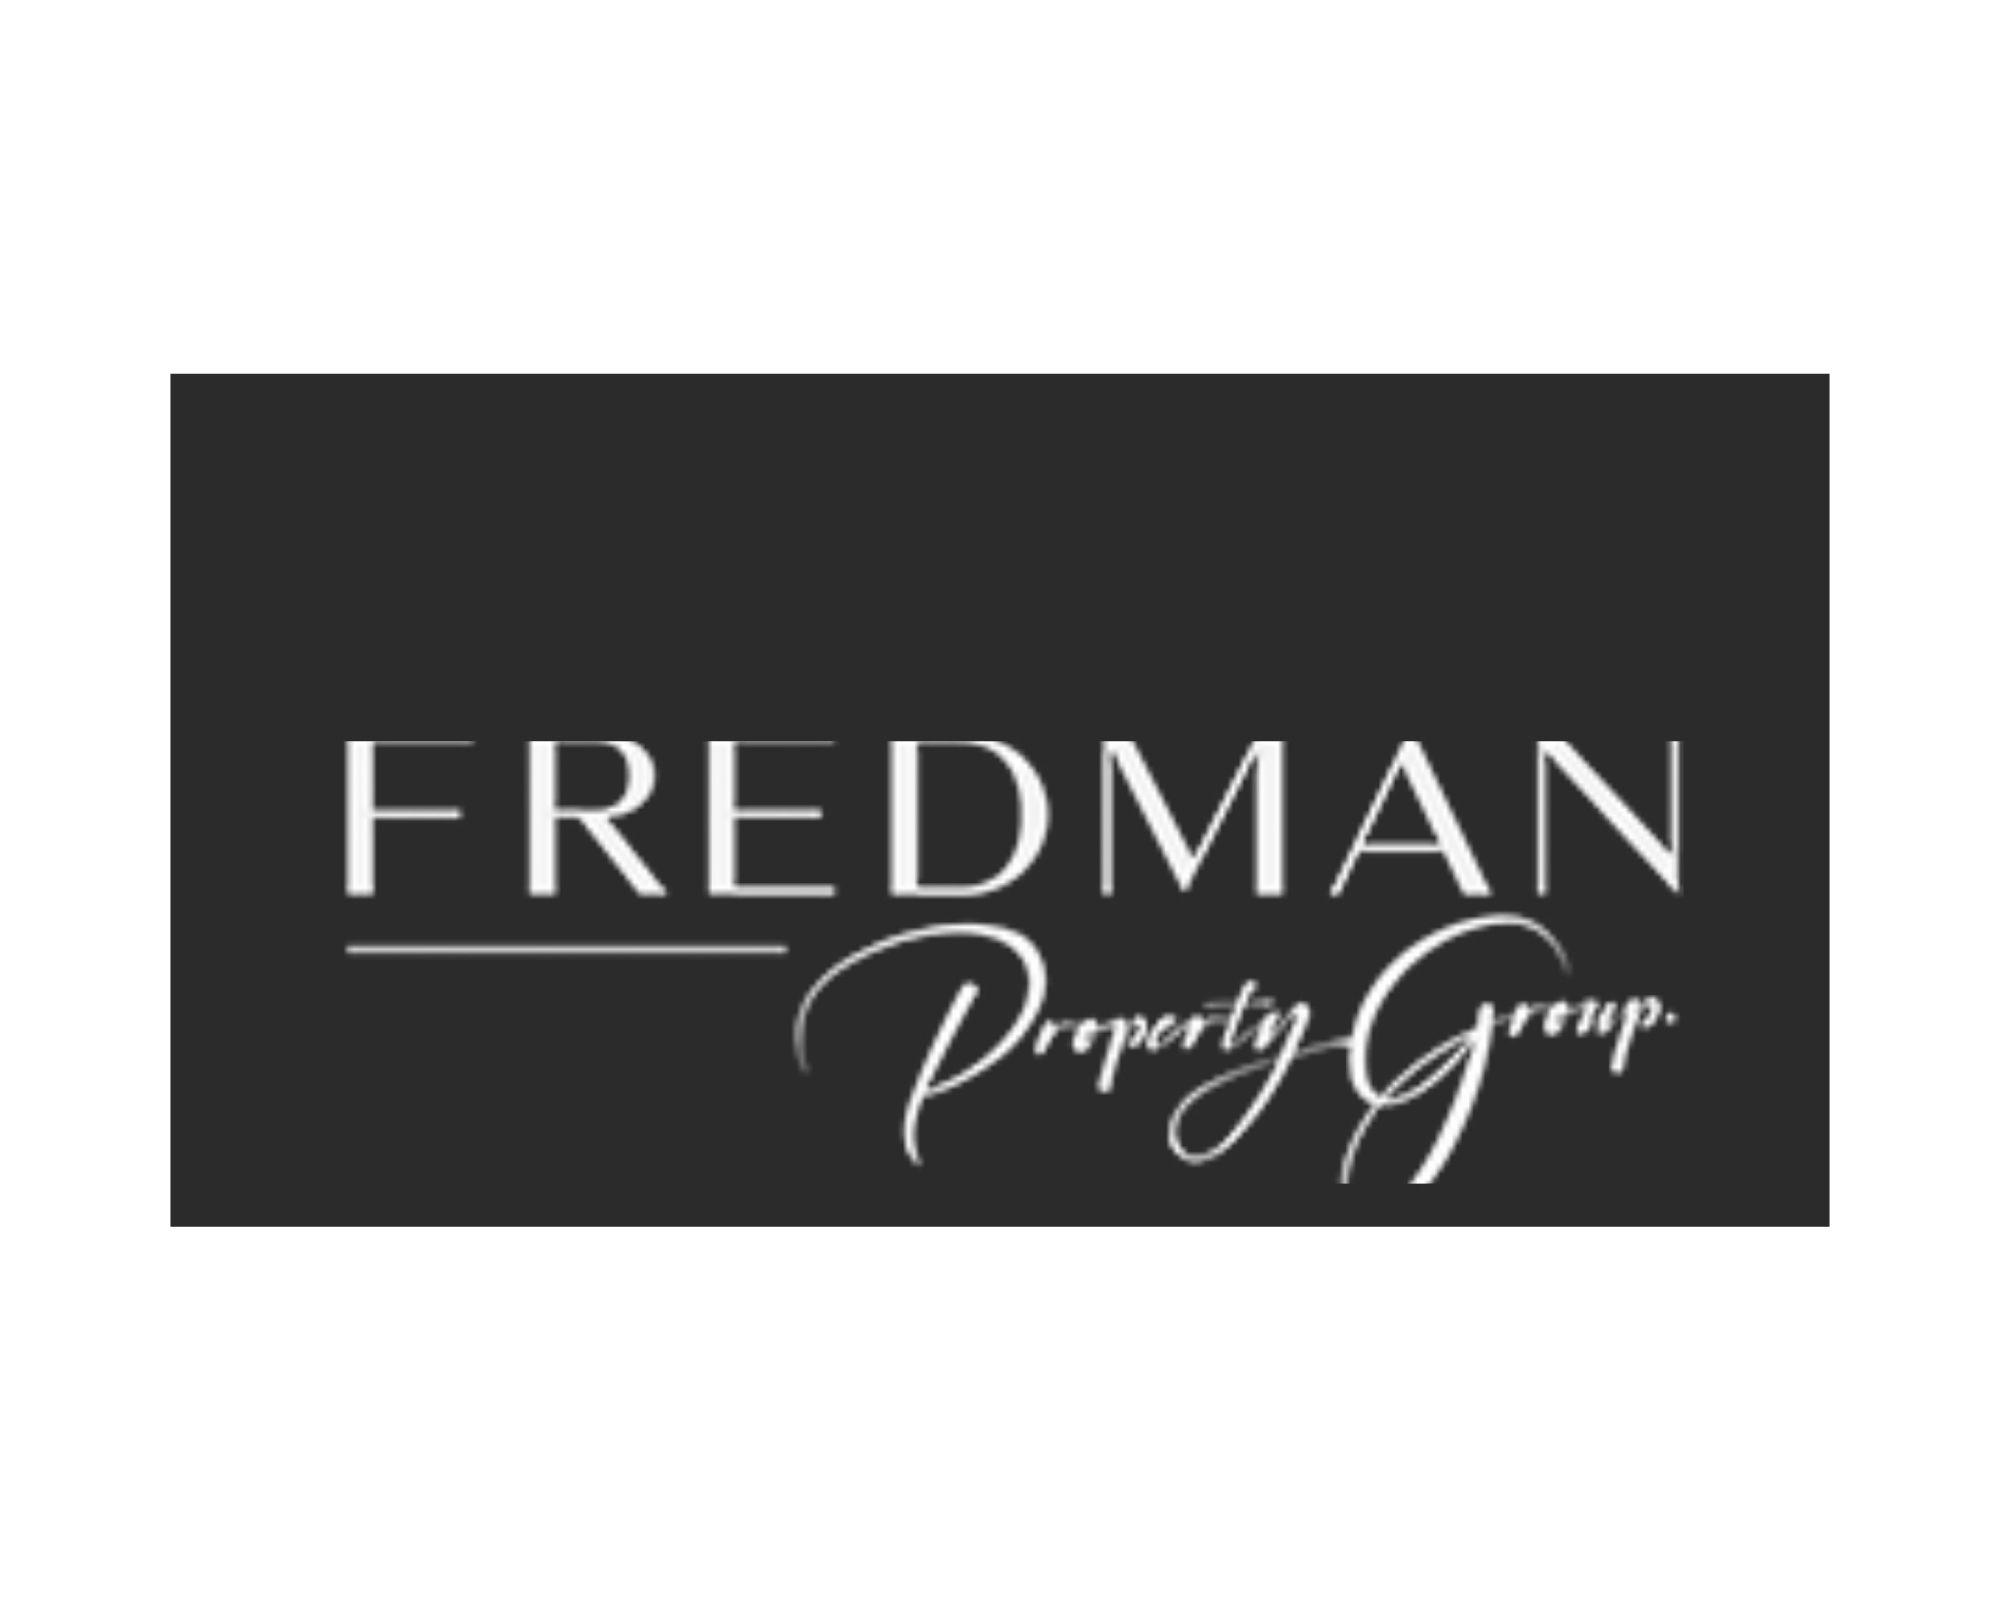 Fredman Property Group